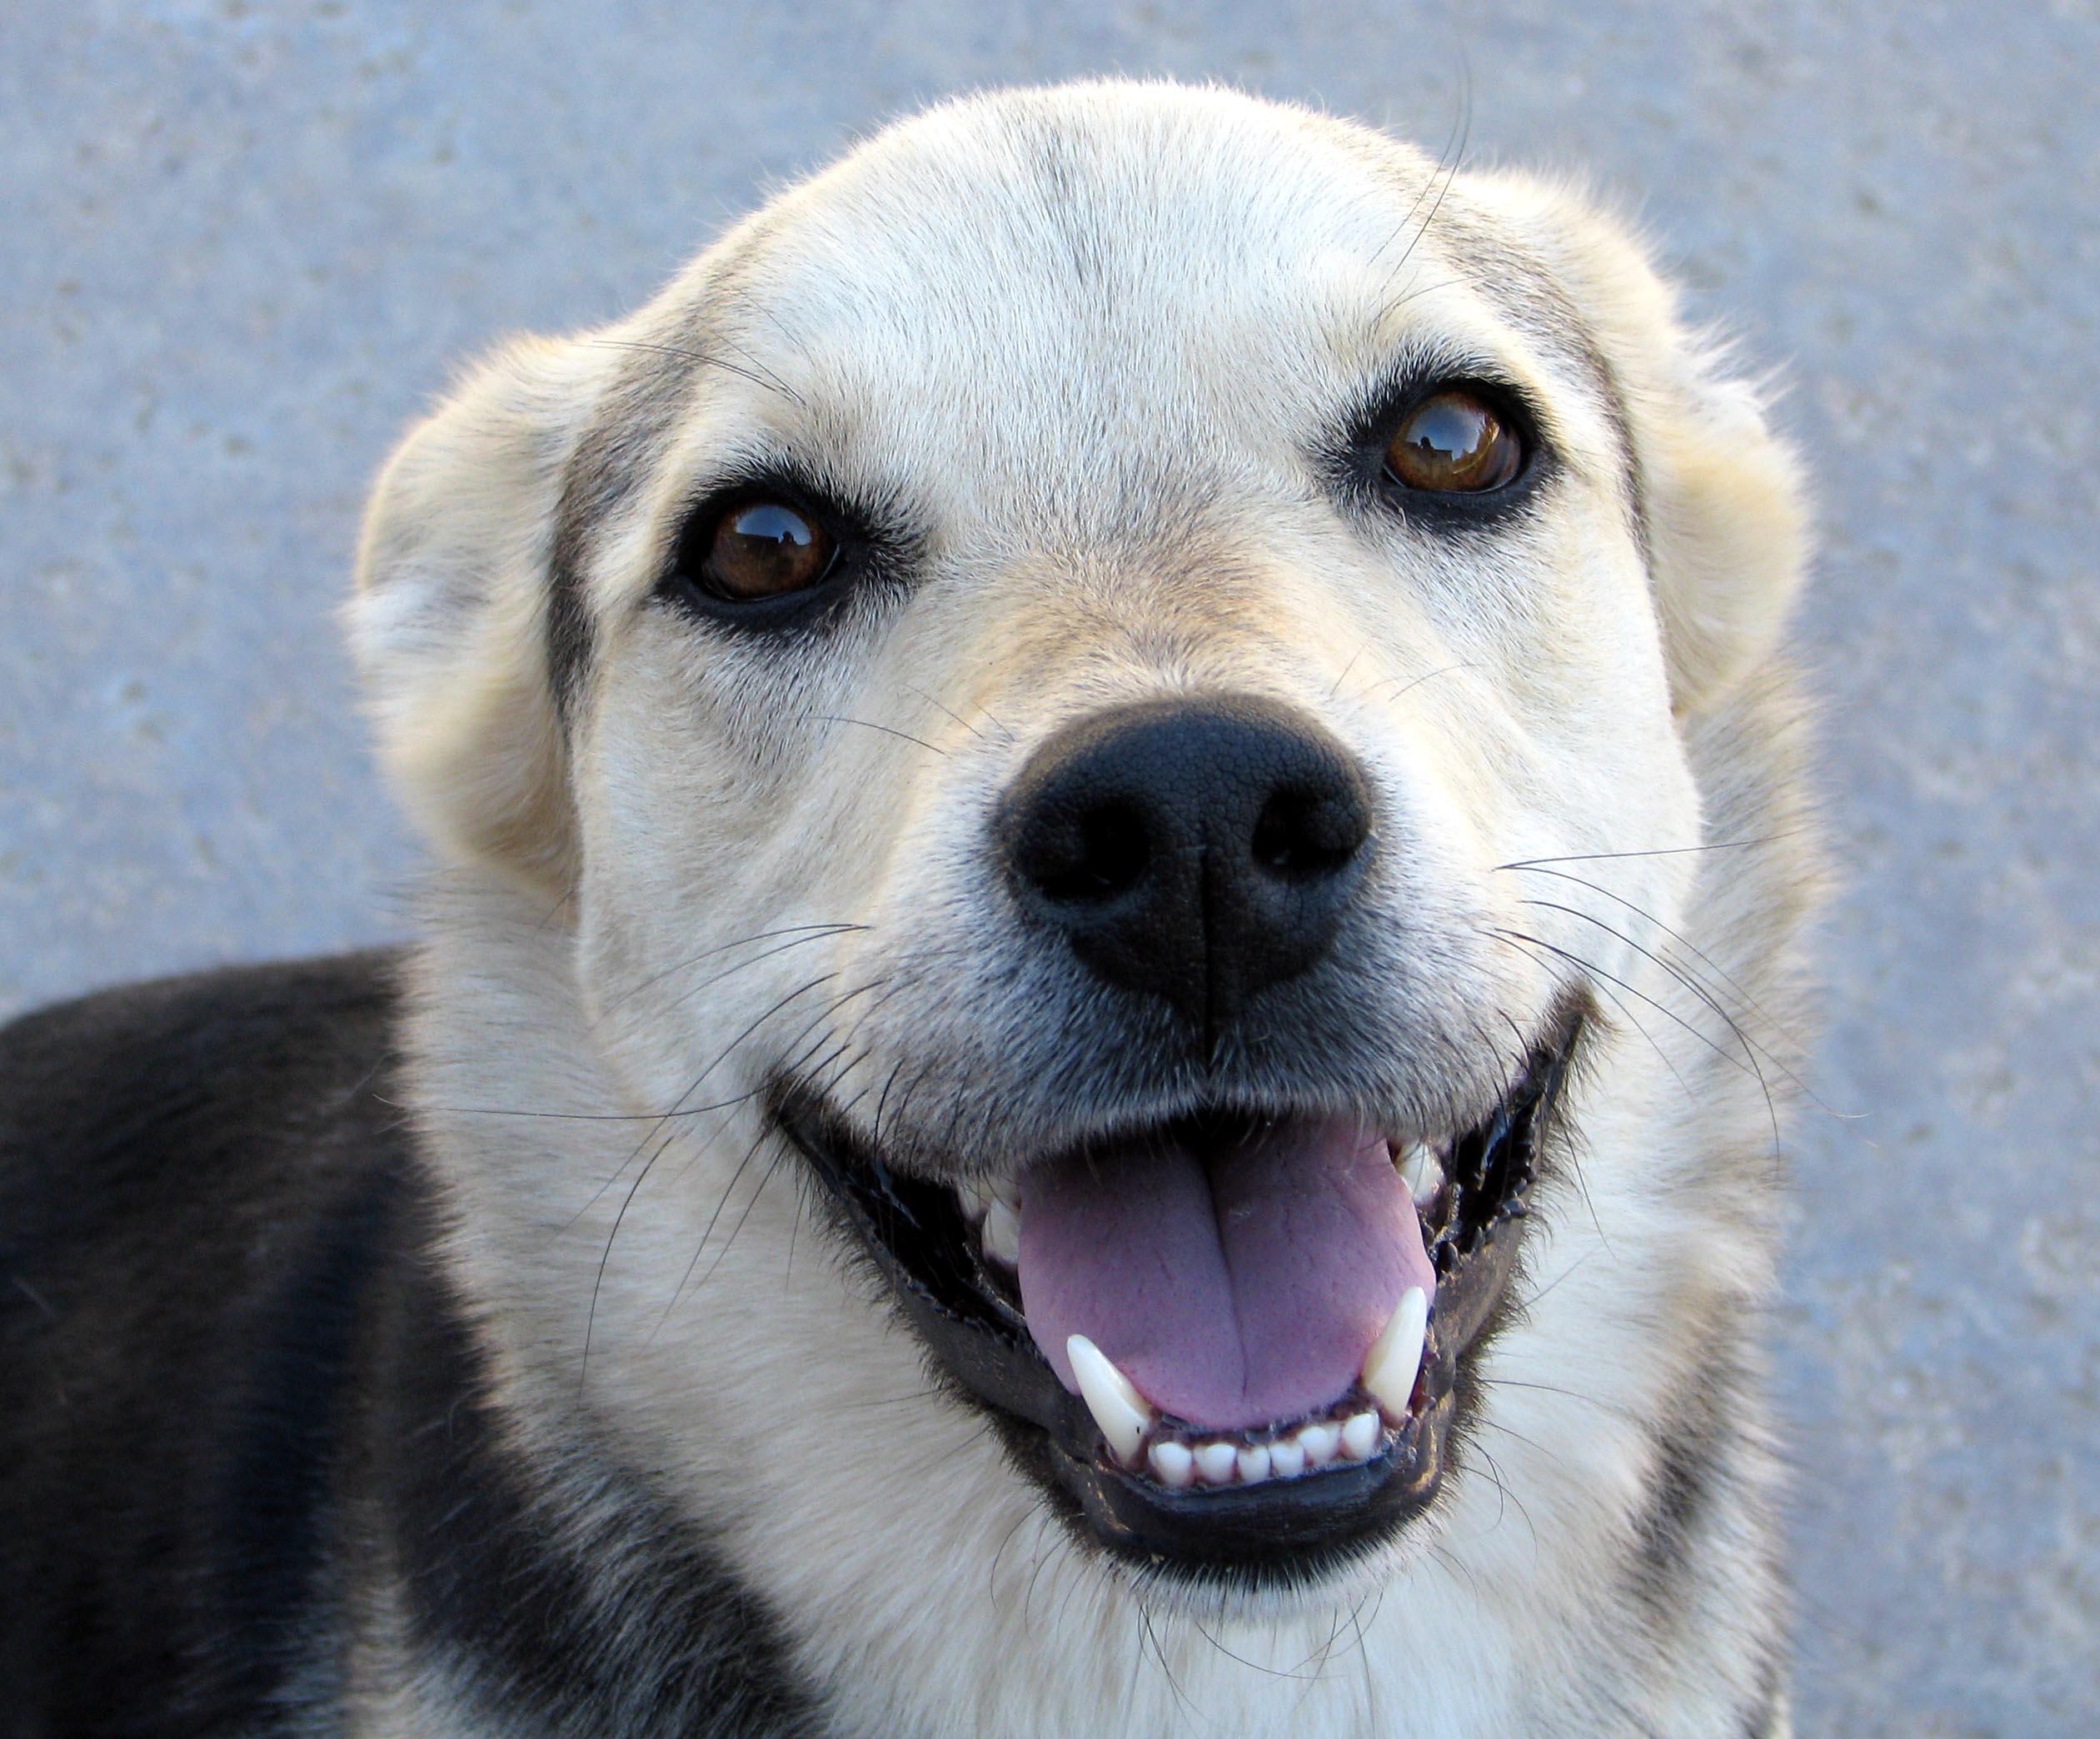 smiling dog flickr photo sharing